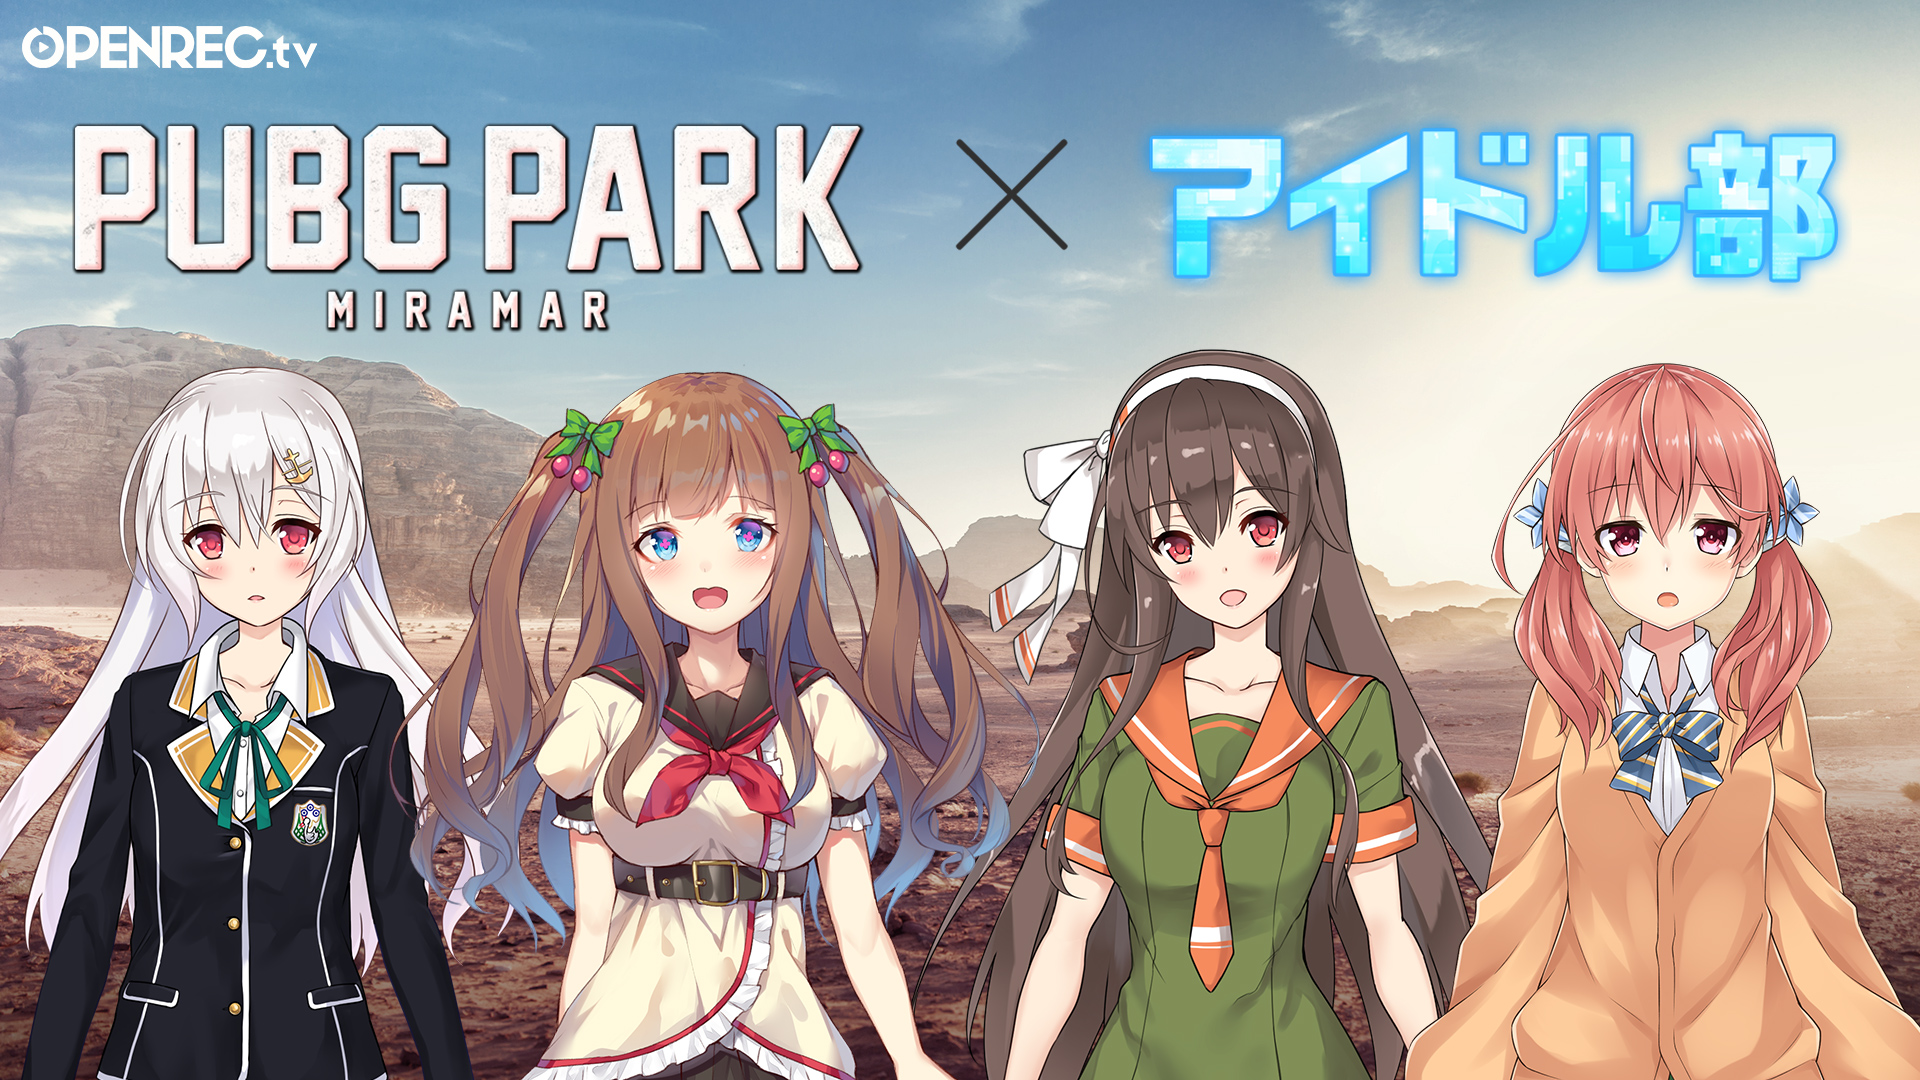 OPENREC.tv公式番組「PUBG PARK」に、バーチャルYouTuberユニット「アイドル部」 メンバー4名(夜桜たま、花京院ちえり、八重沢なとり、北上双葉)出演決定!